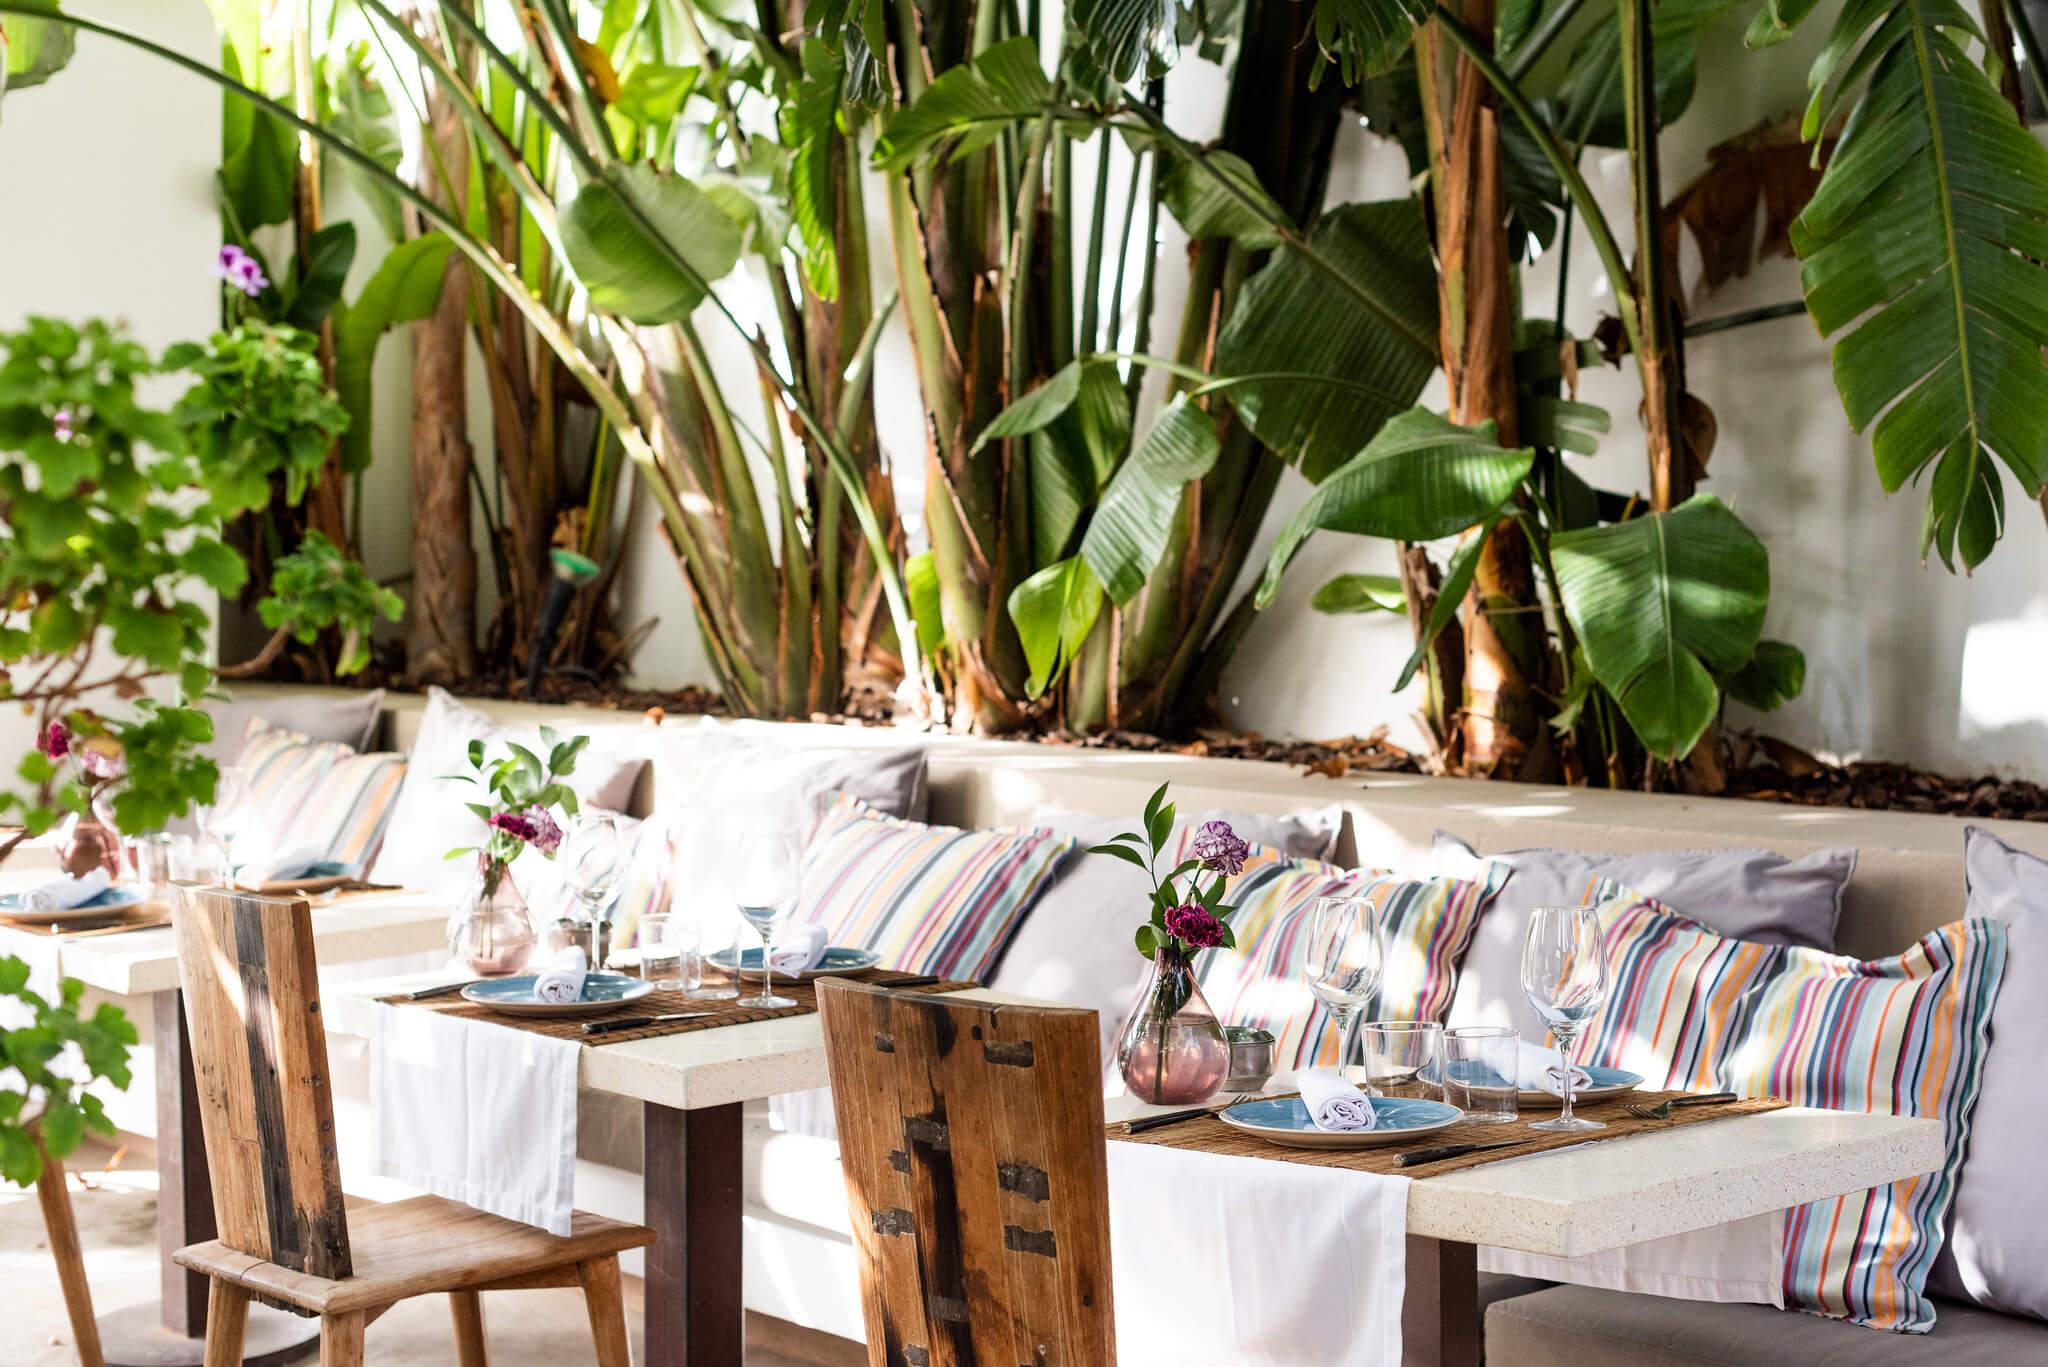 https://www.white-ibiza.com/wp-content/uploads/2020/03/ibiza-restaurants-the-giri-cafe-2020-12.jpg